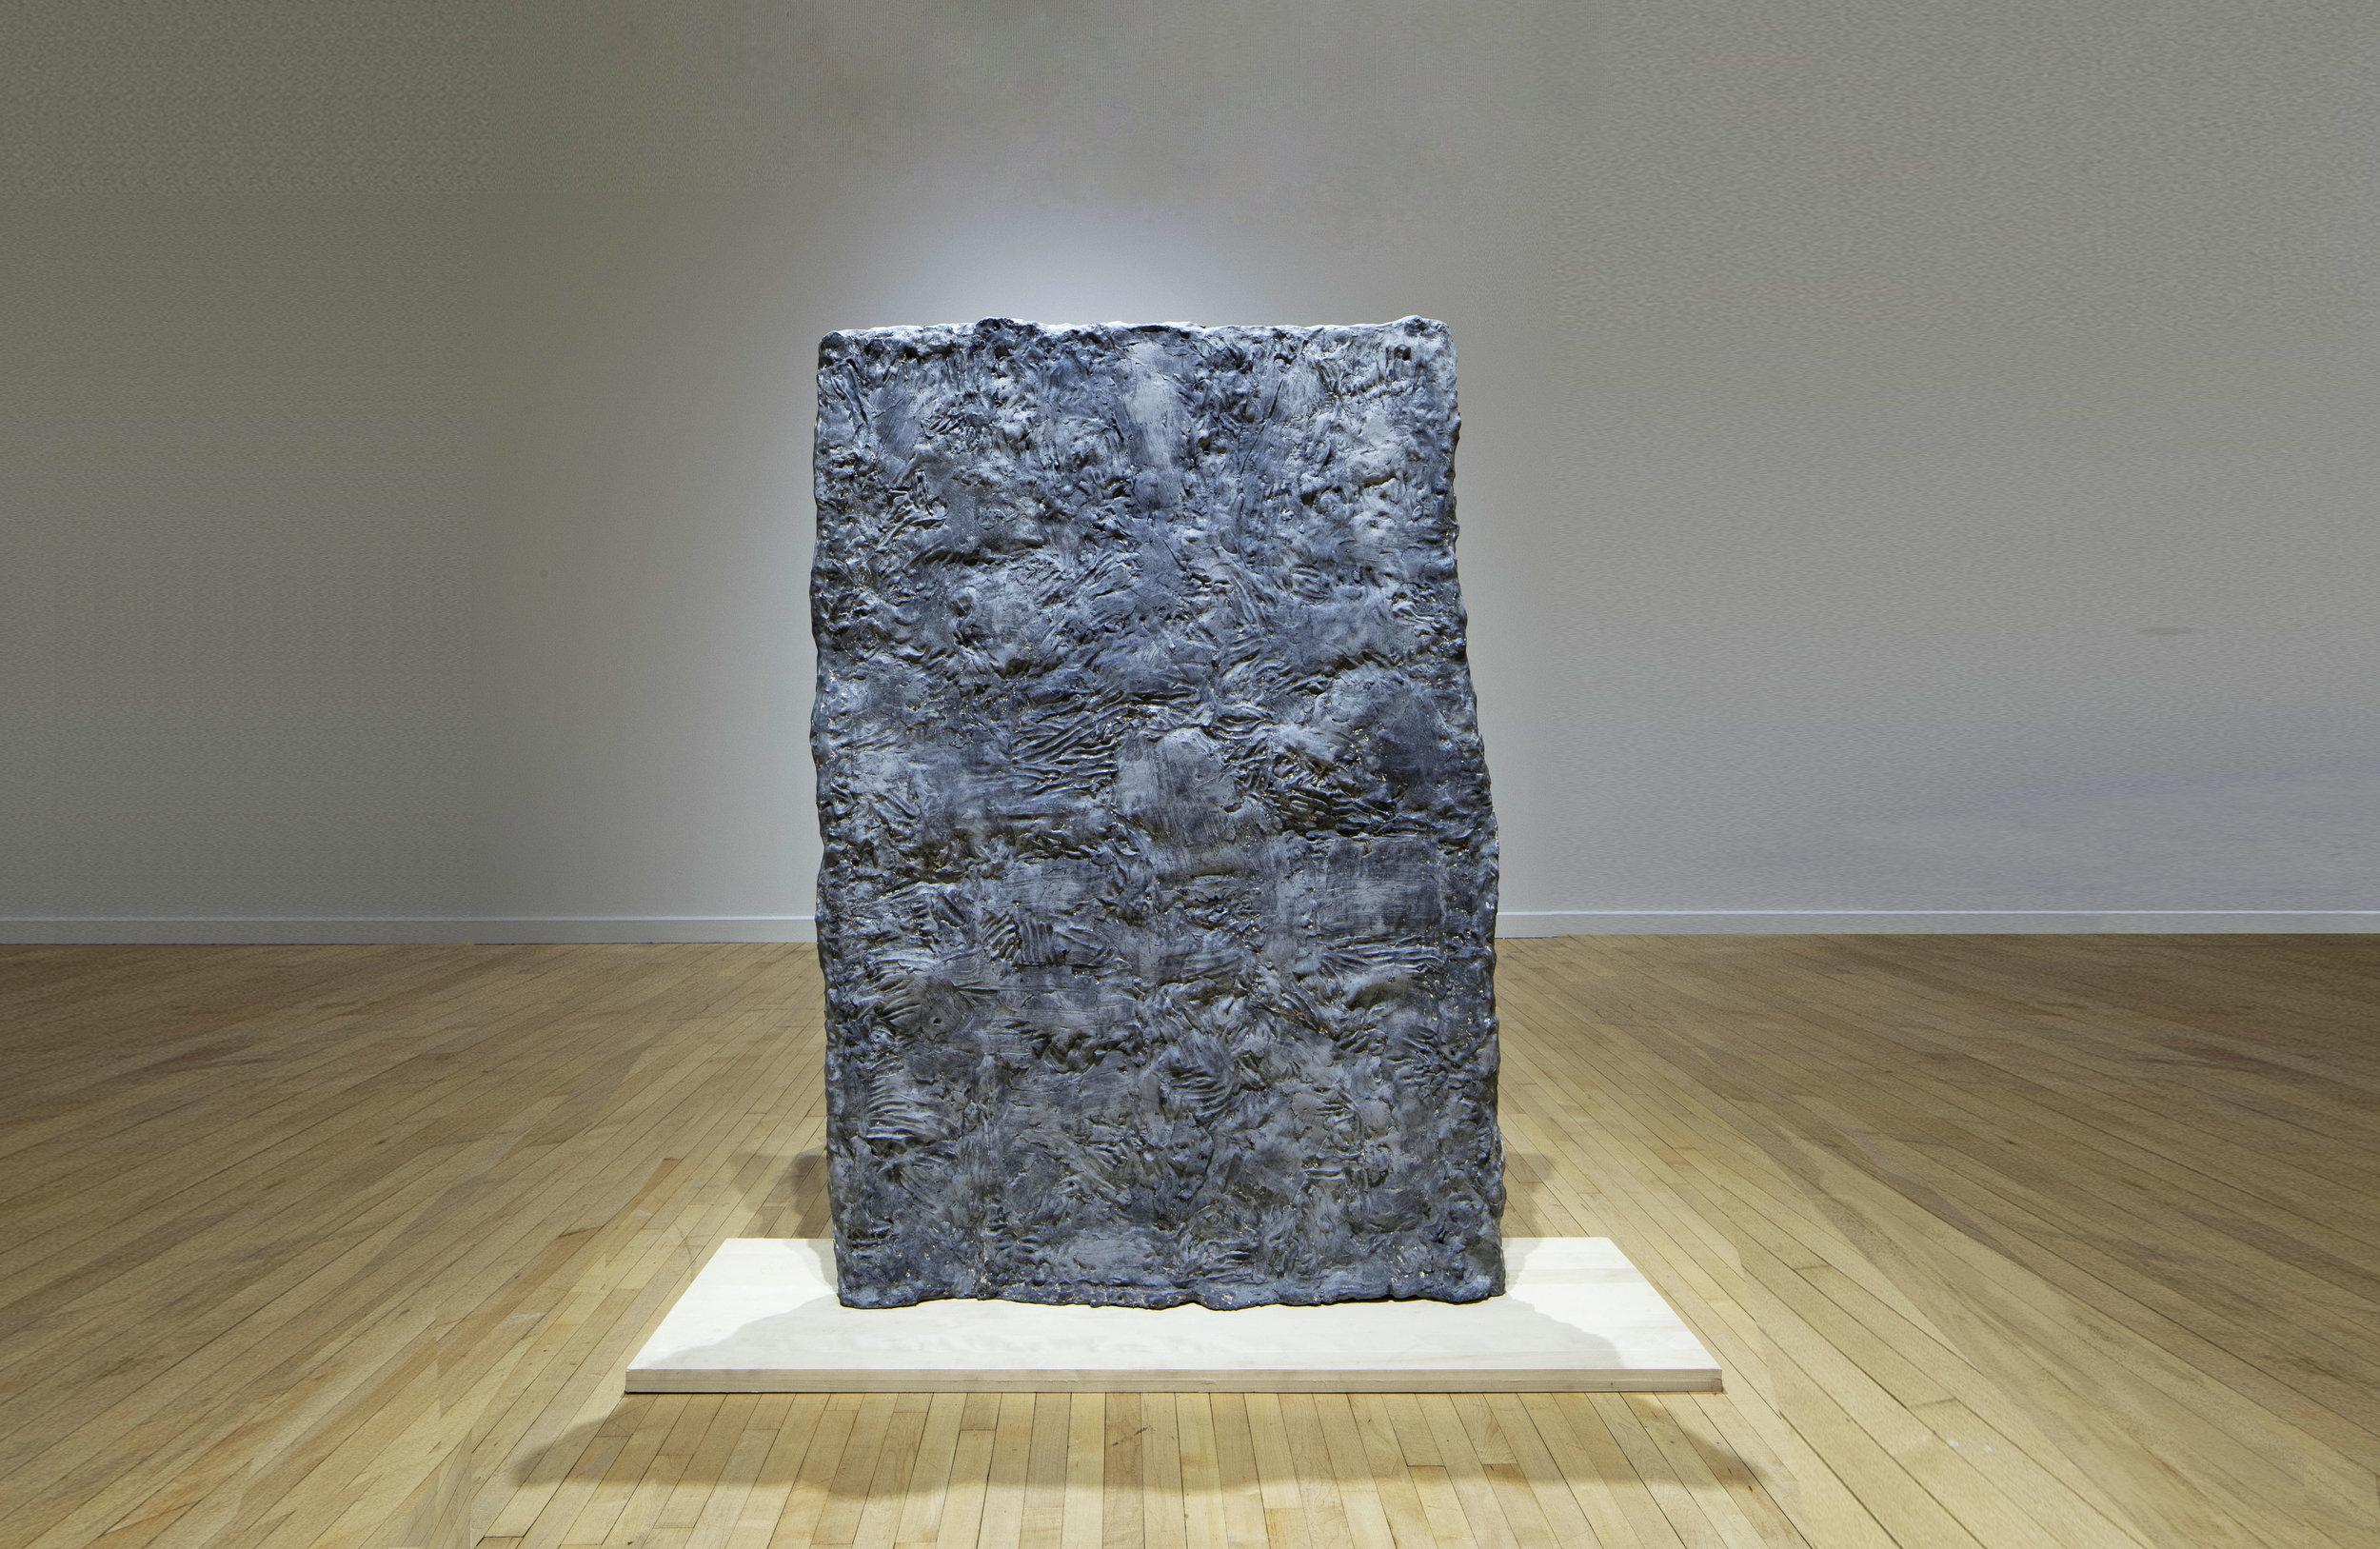 Exhale, resin and fiberglass, 72 x 48 x 5 in, 2017. 4th. Bronx Museum Biennial.